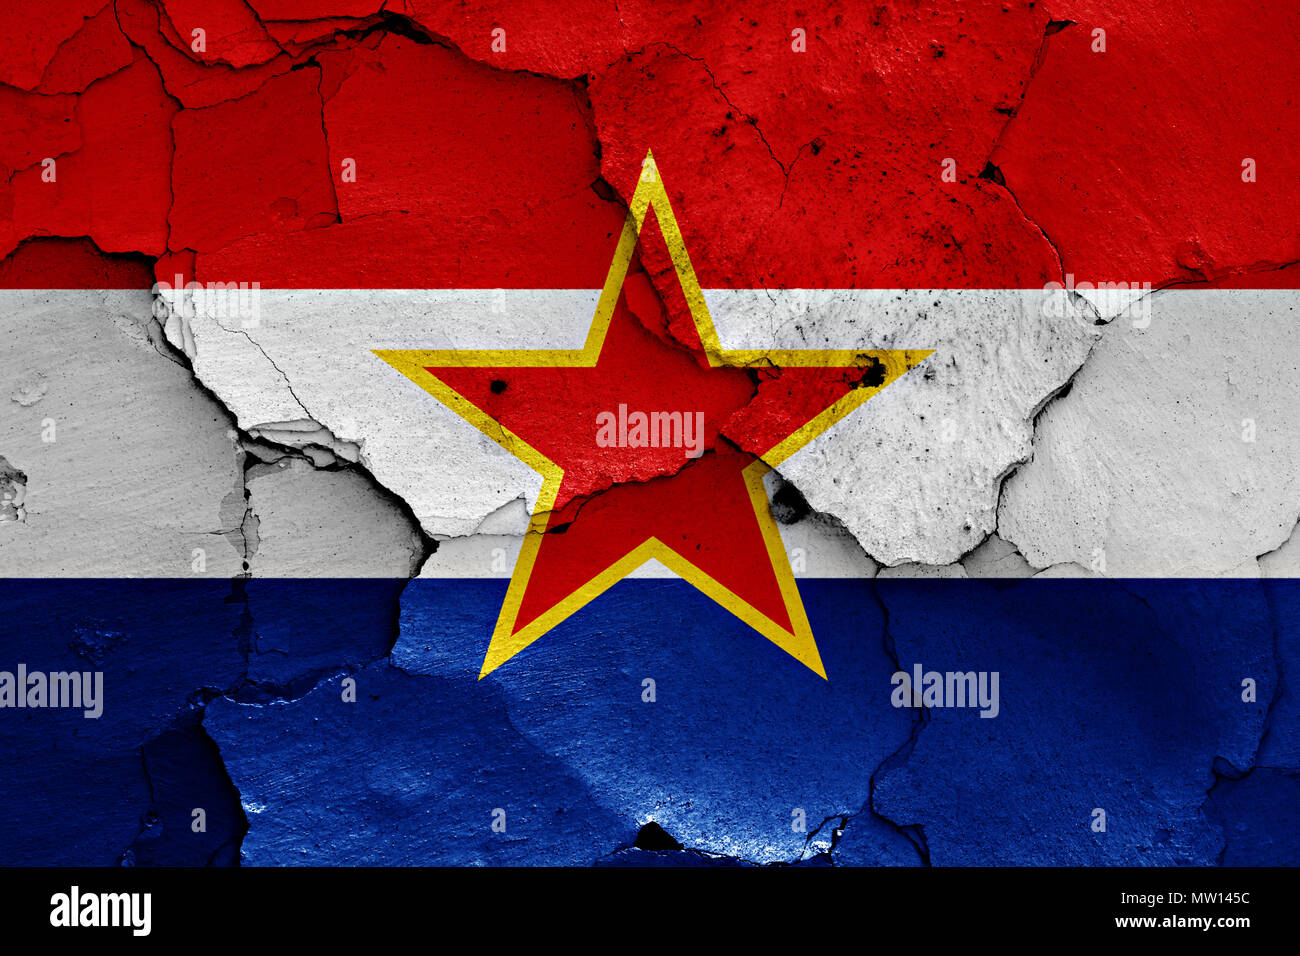 Flagge der Sozialistischen Republik Kroatien Stockbild